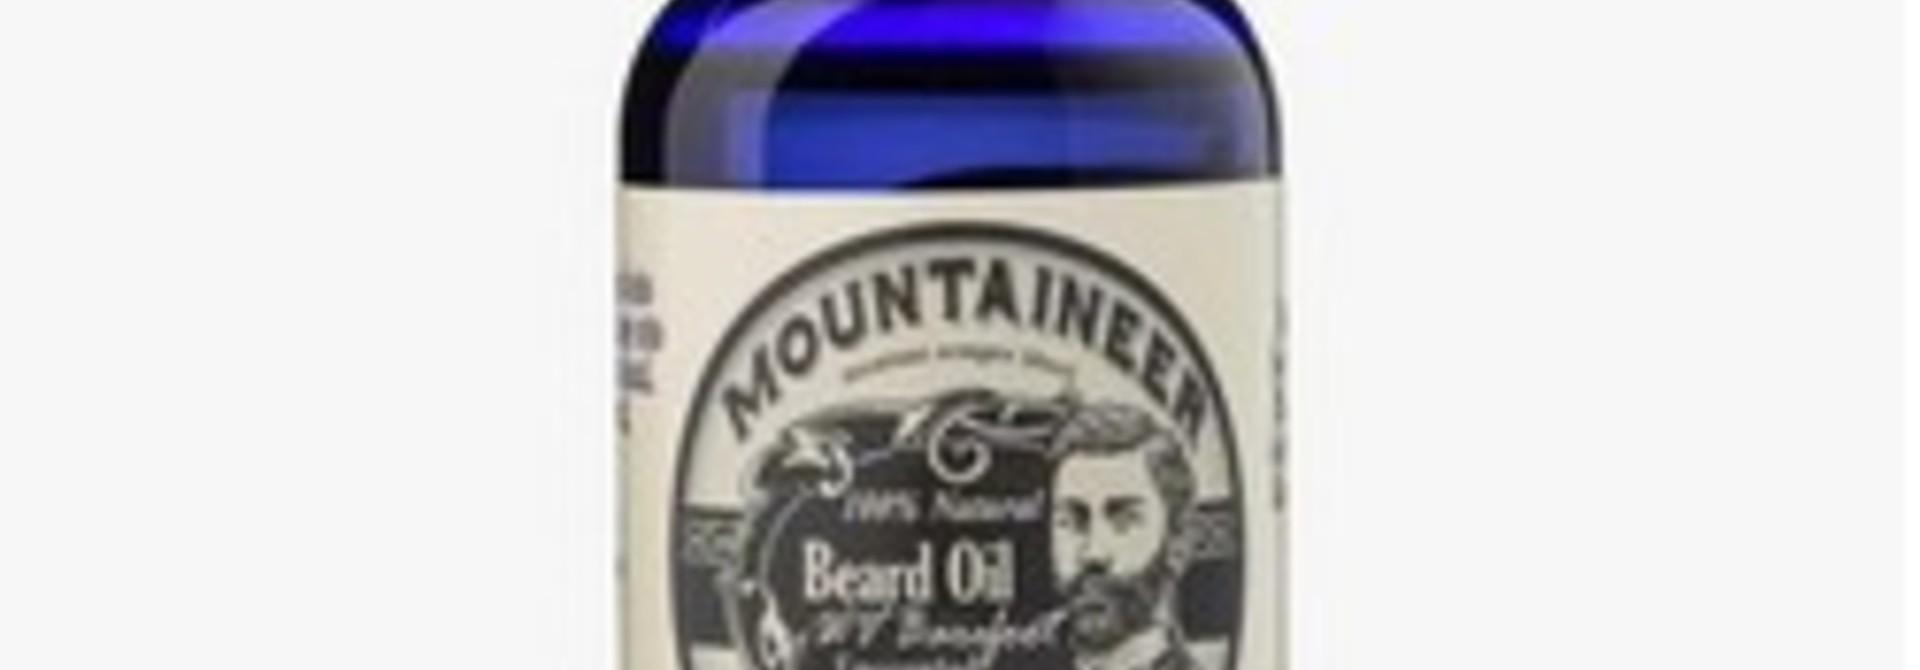 Beard Oil 2 oz., Citrus and Spice